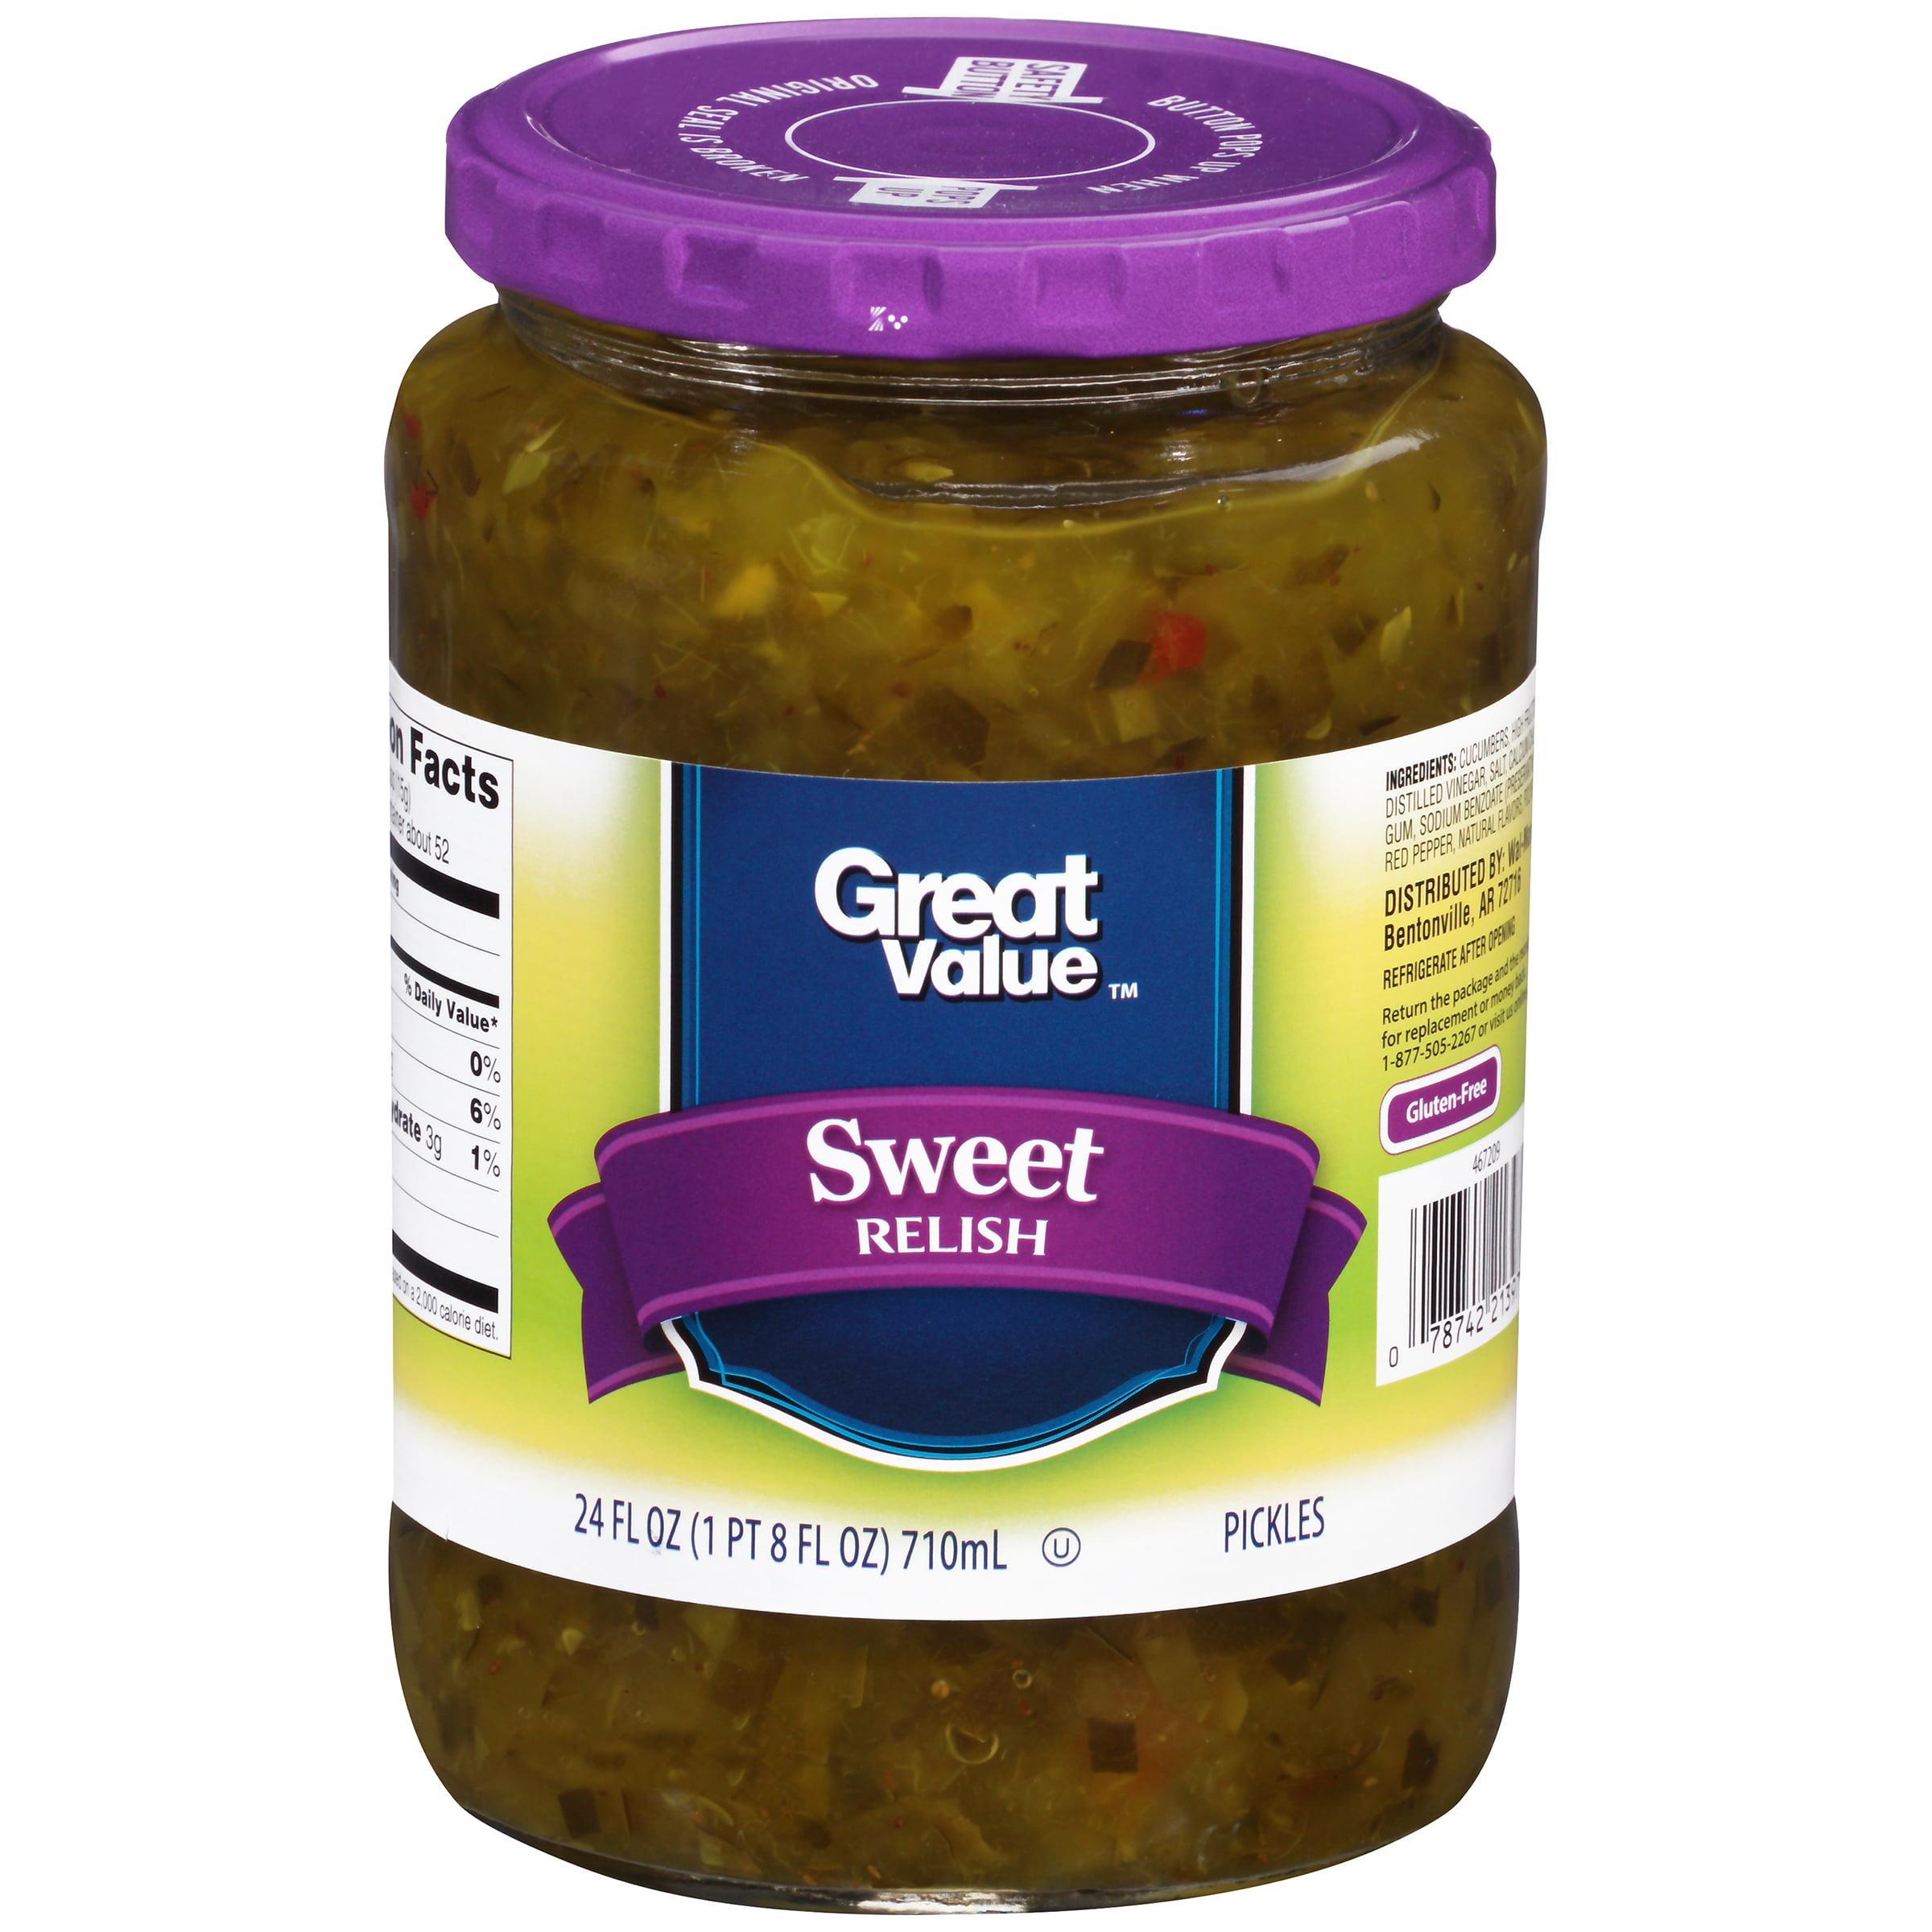 Great Value™ Sweet Relish 24 fl. oz. Jar